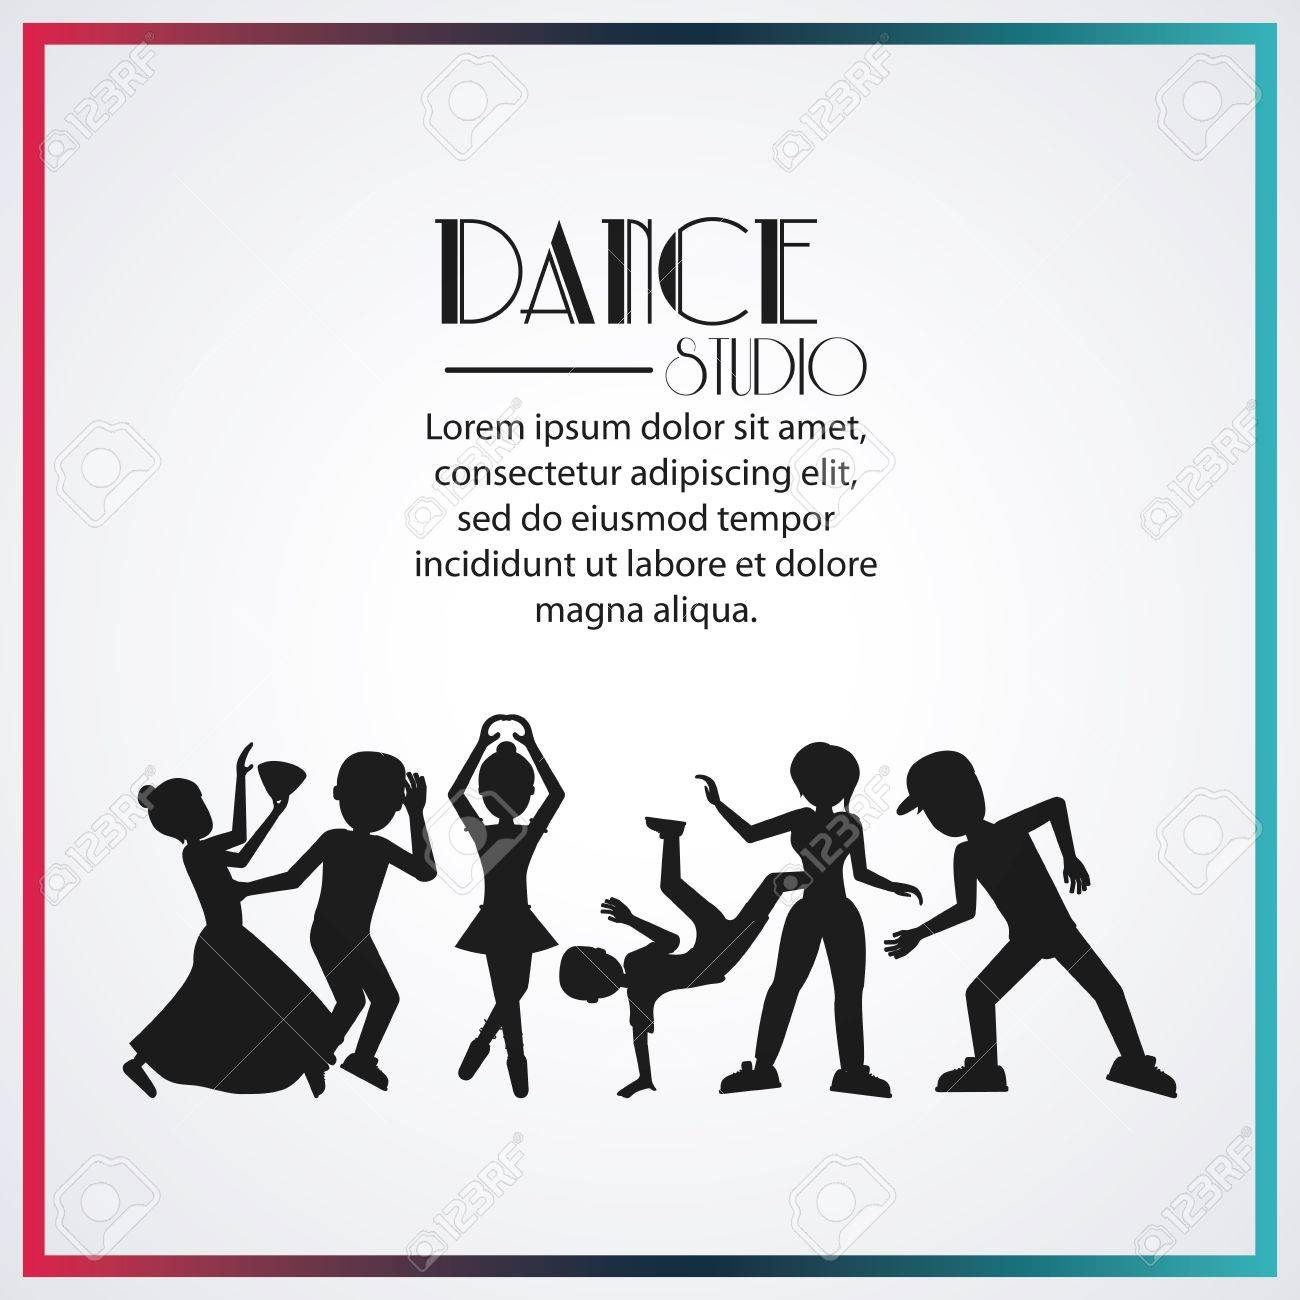 Girls Boys Cartoons Avatar Dancer Dance Studio Academy Advertising ...